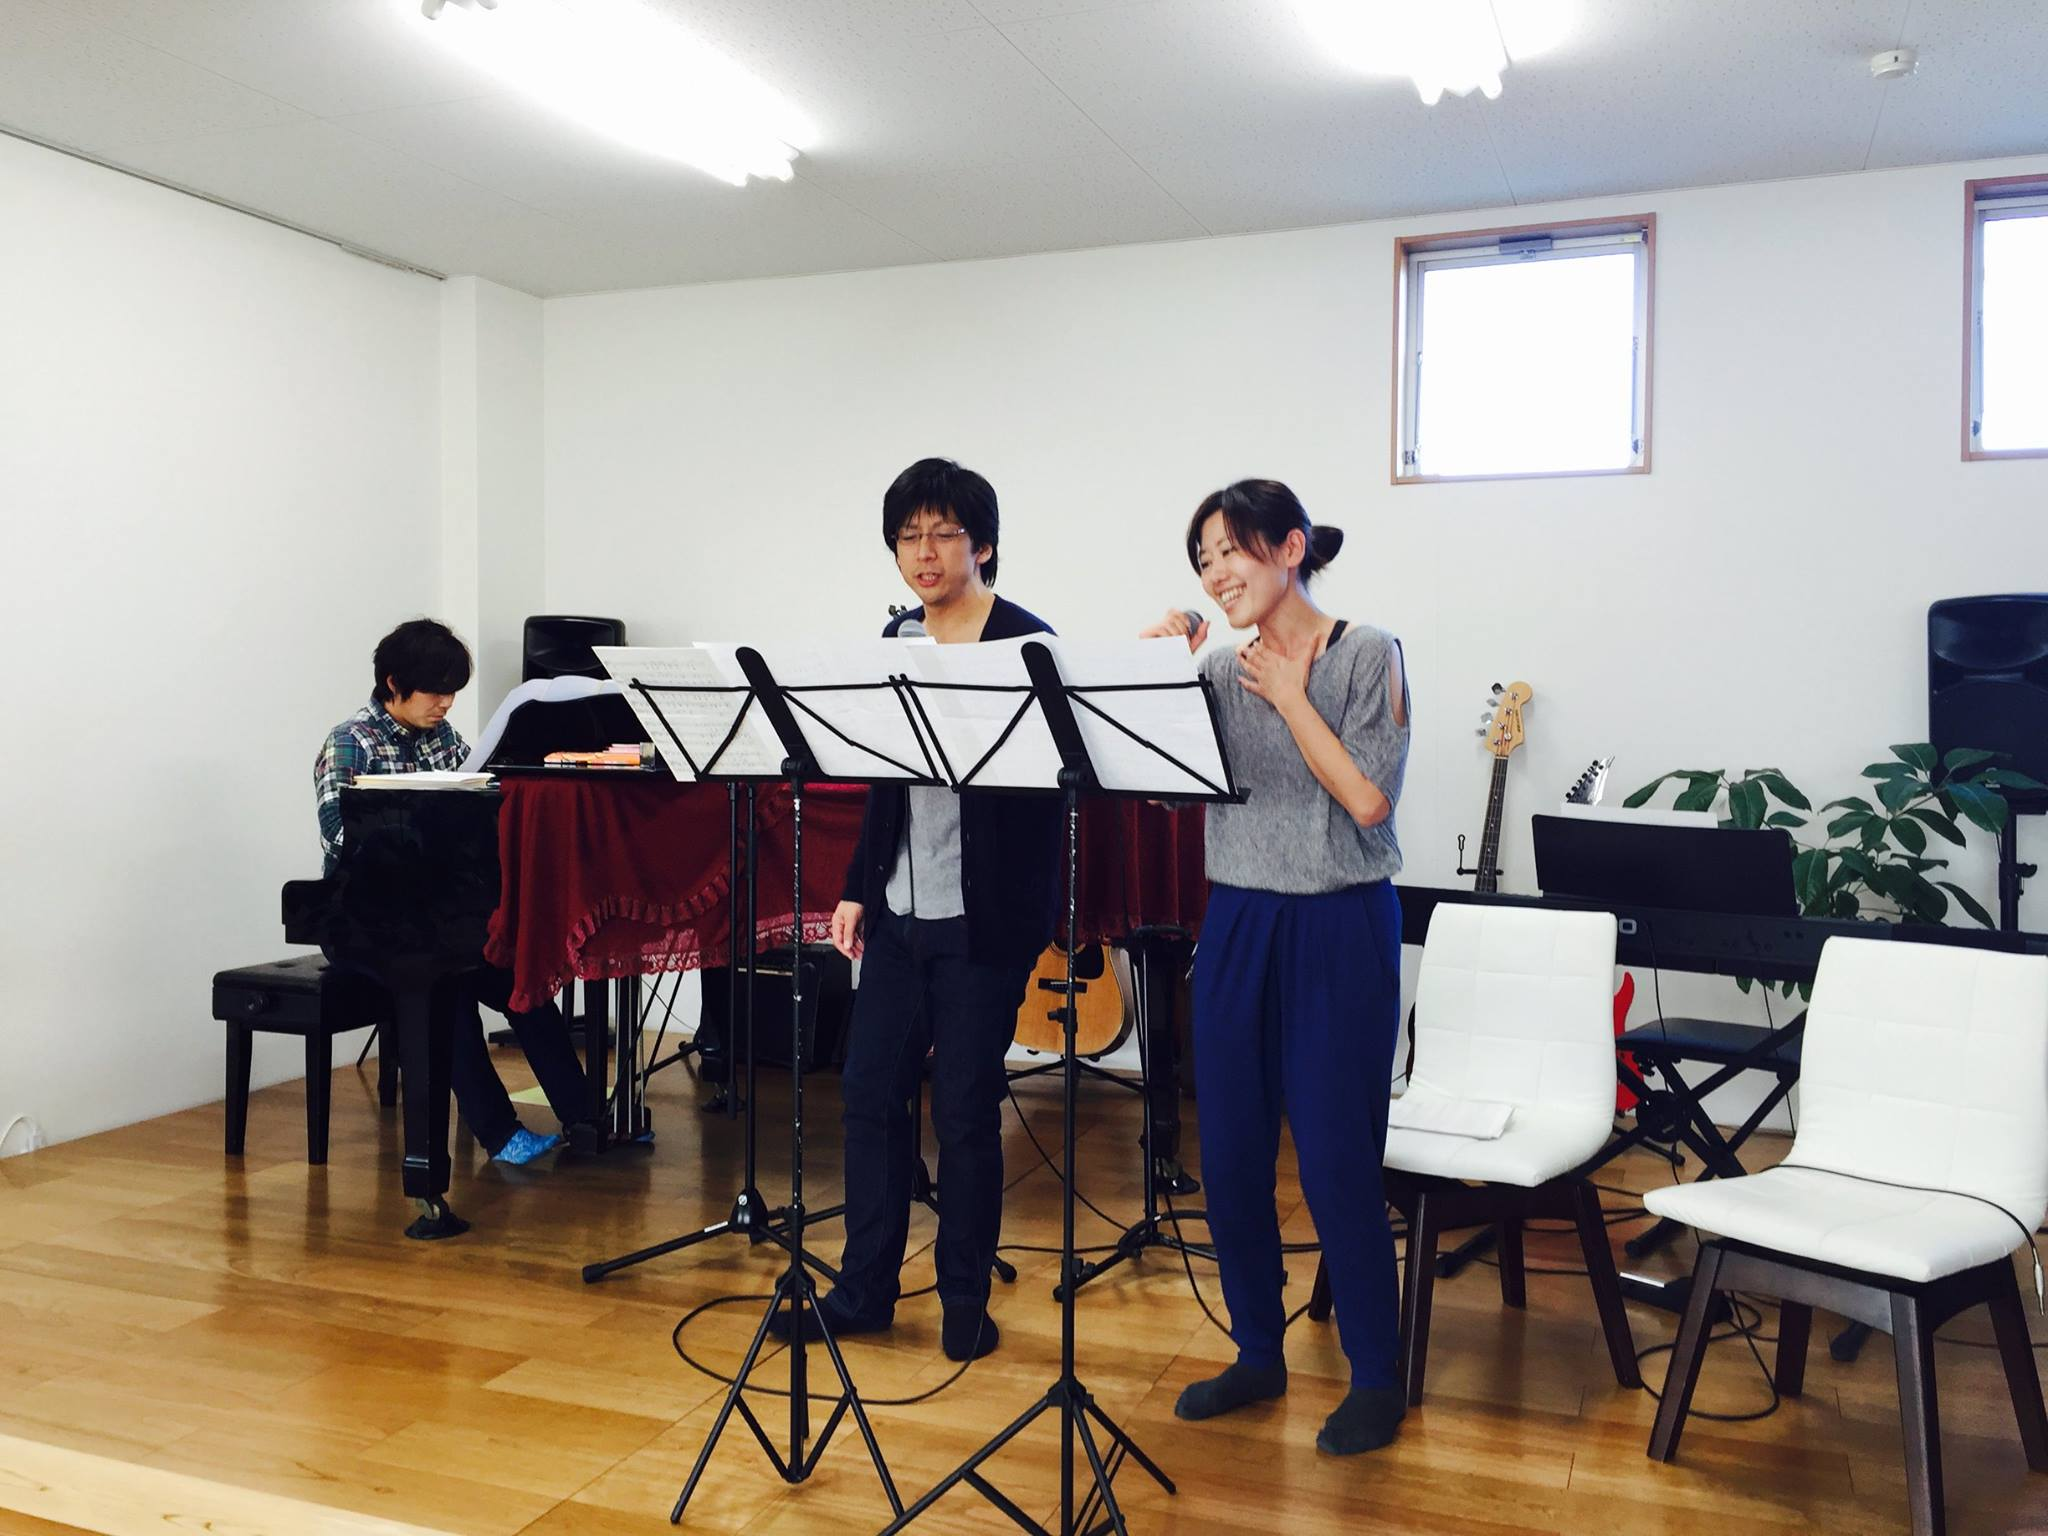 VOCEミュージックスクール・カルチャースクールメイン画像